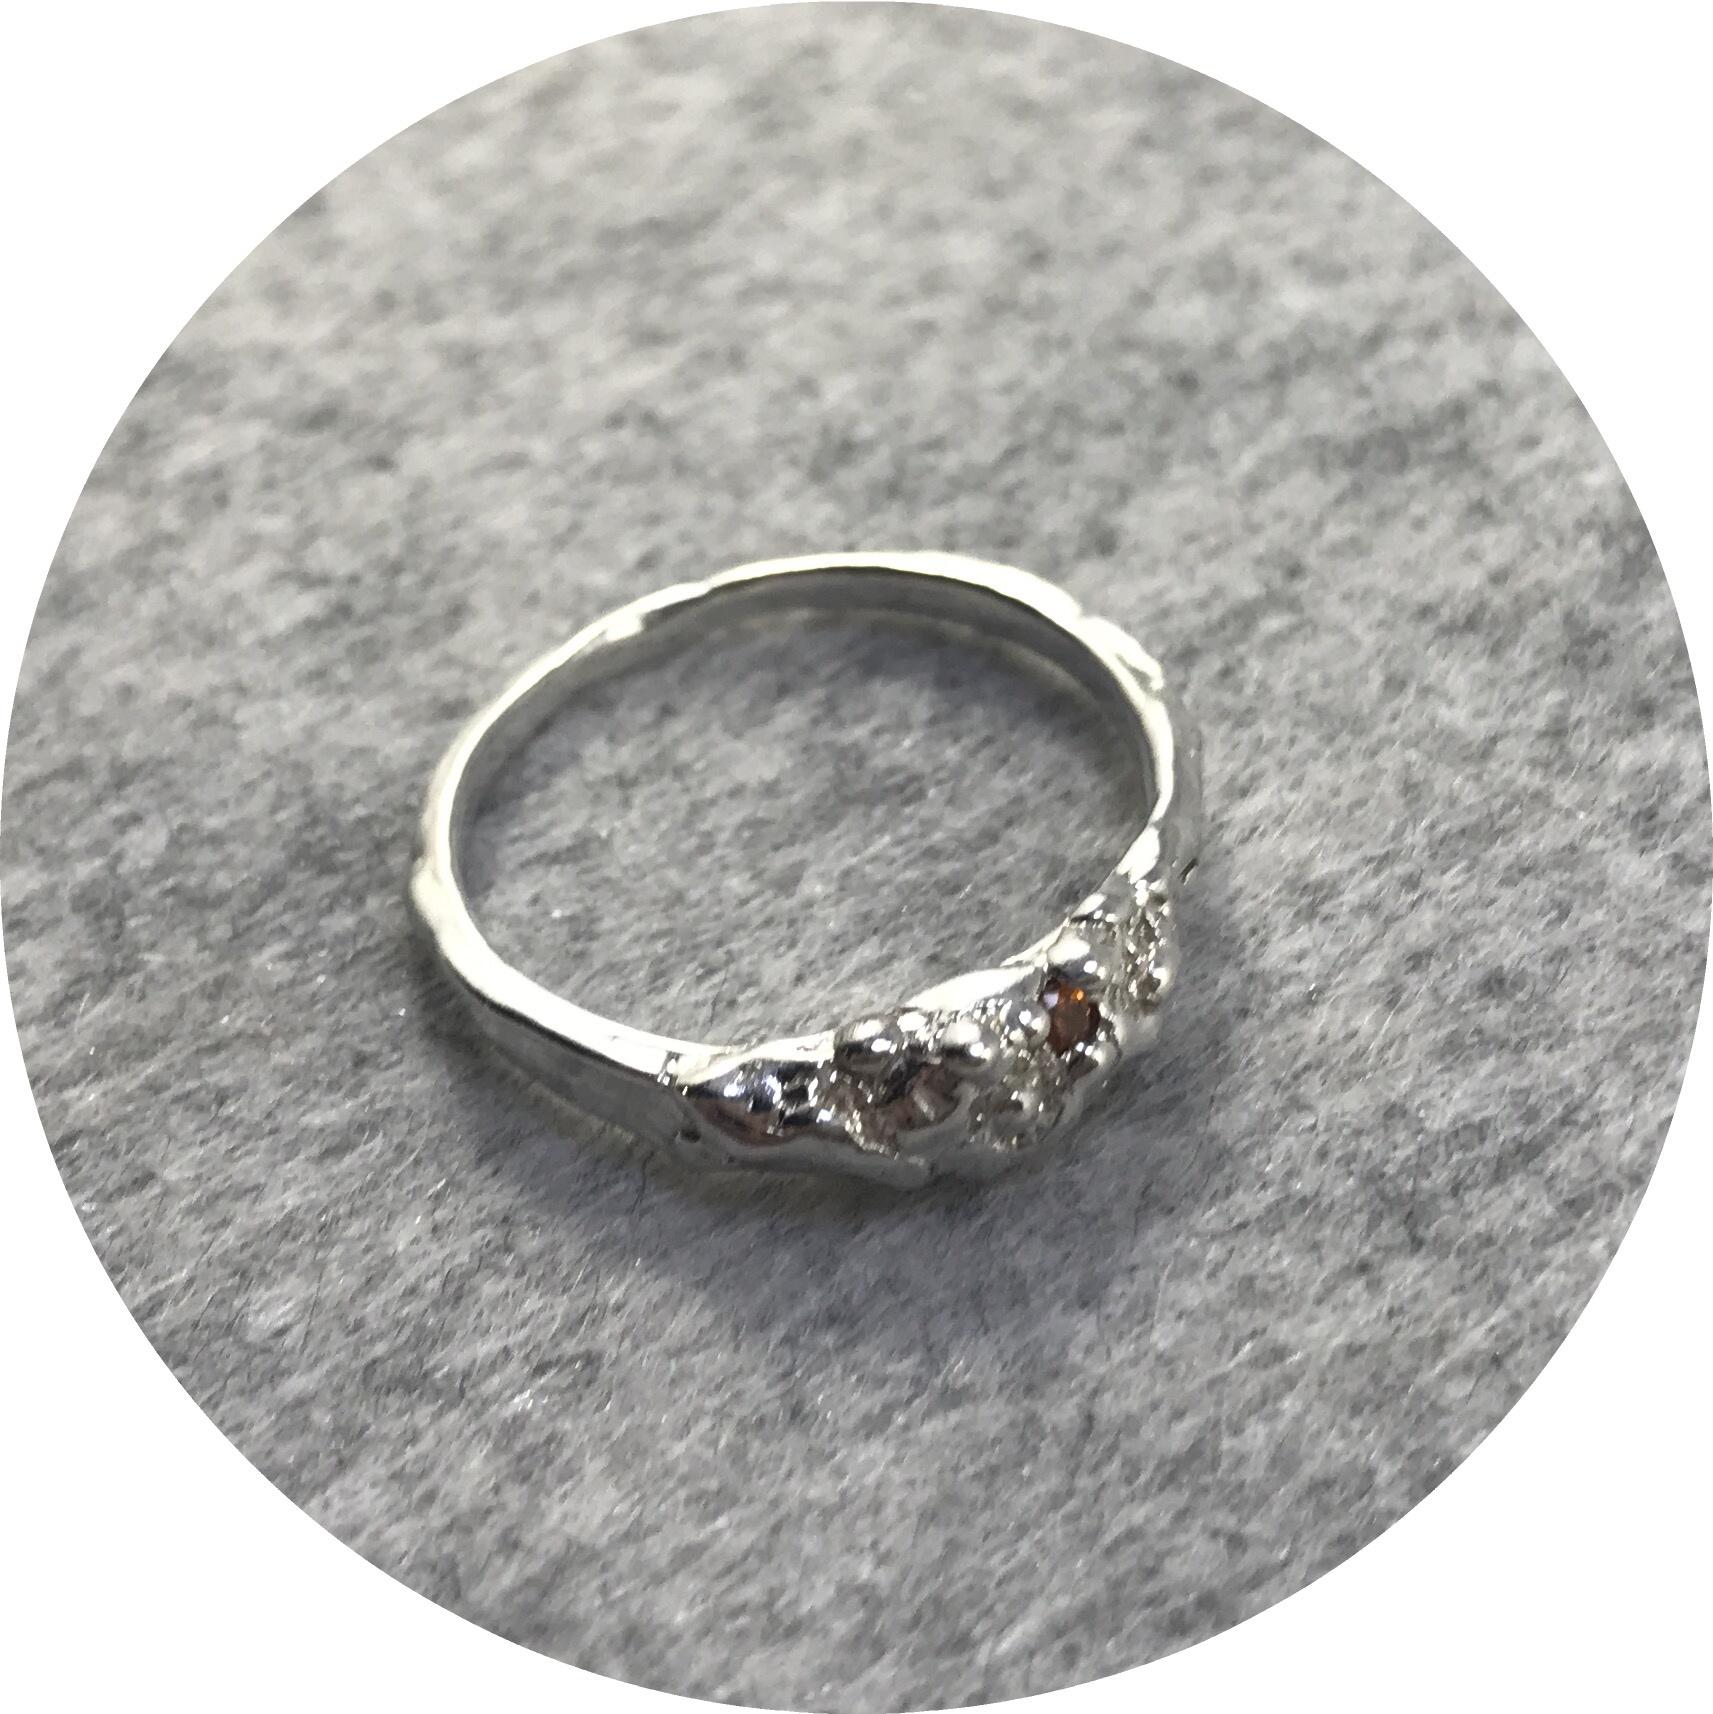 Lizzie Slattery- Organic Trilogy ring. Sterling silver and Orange Garnet. size Q.